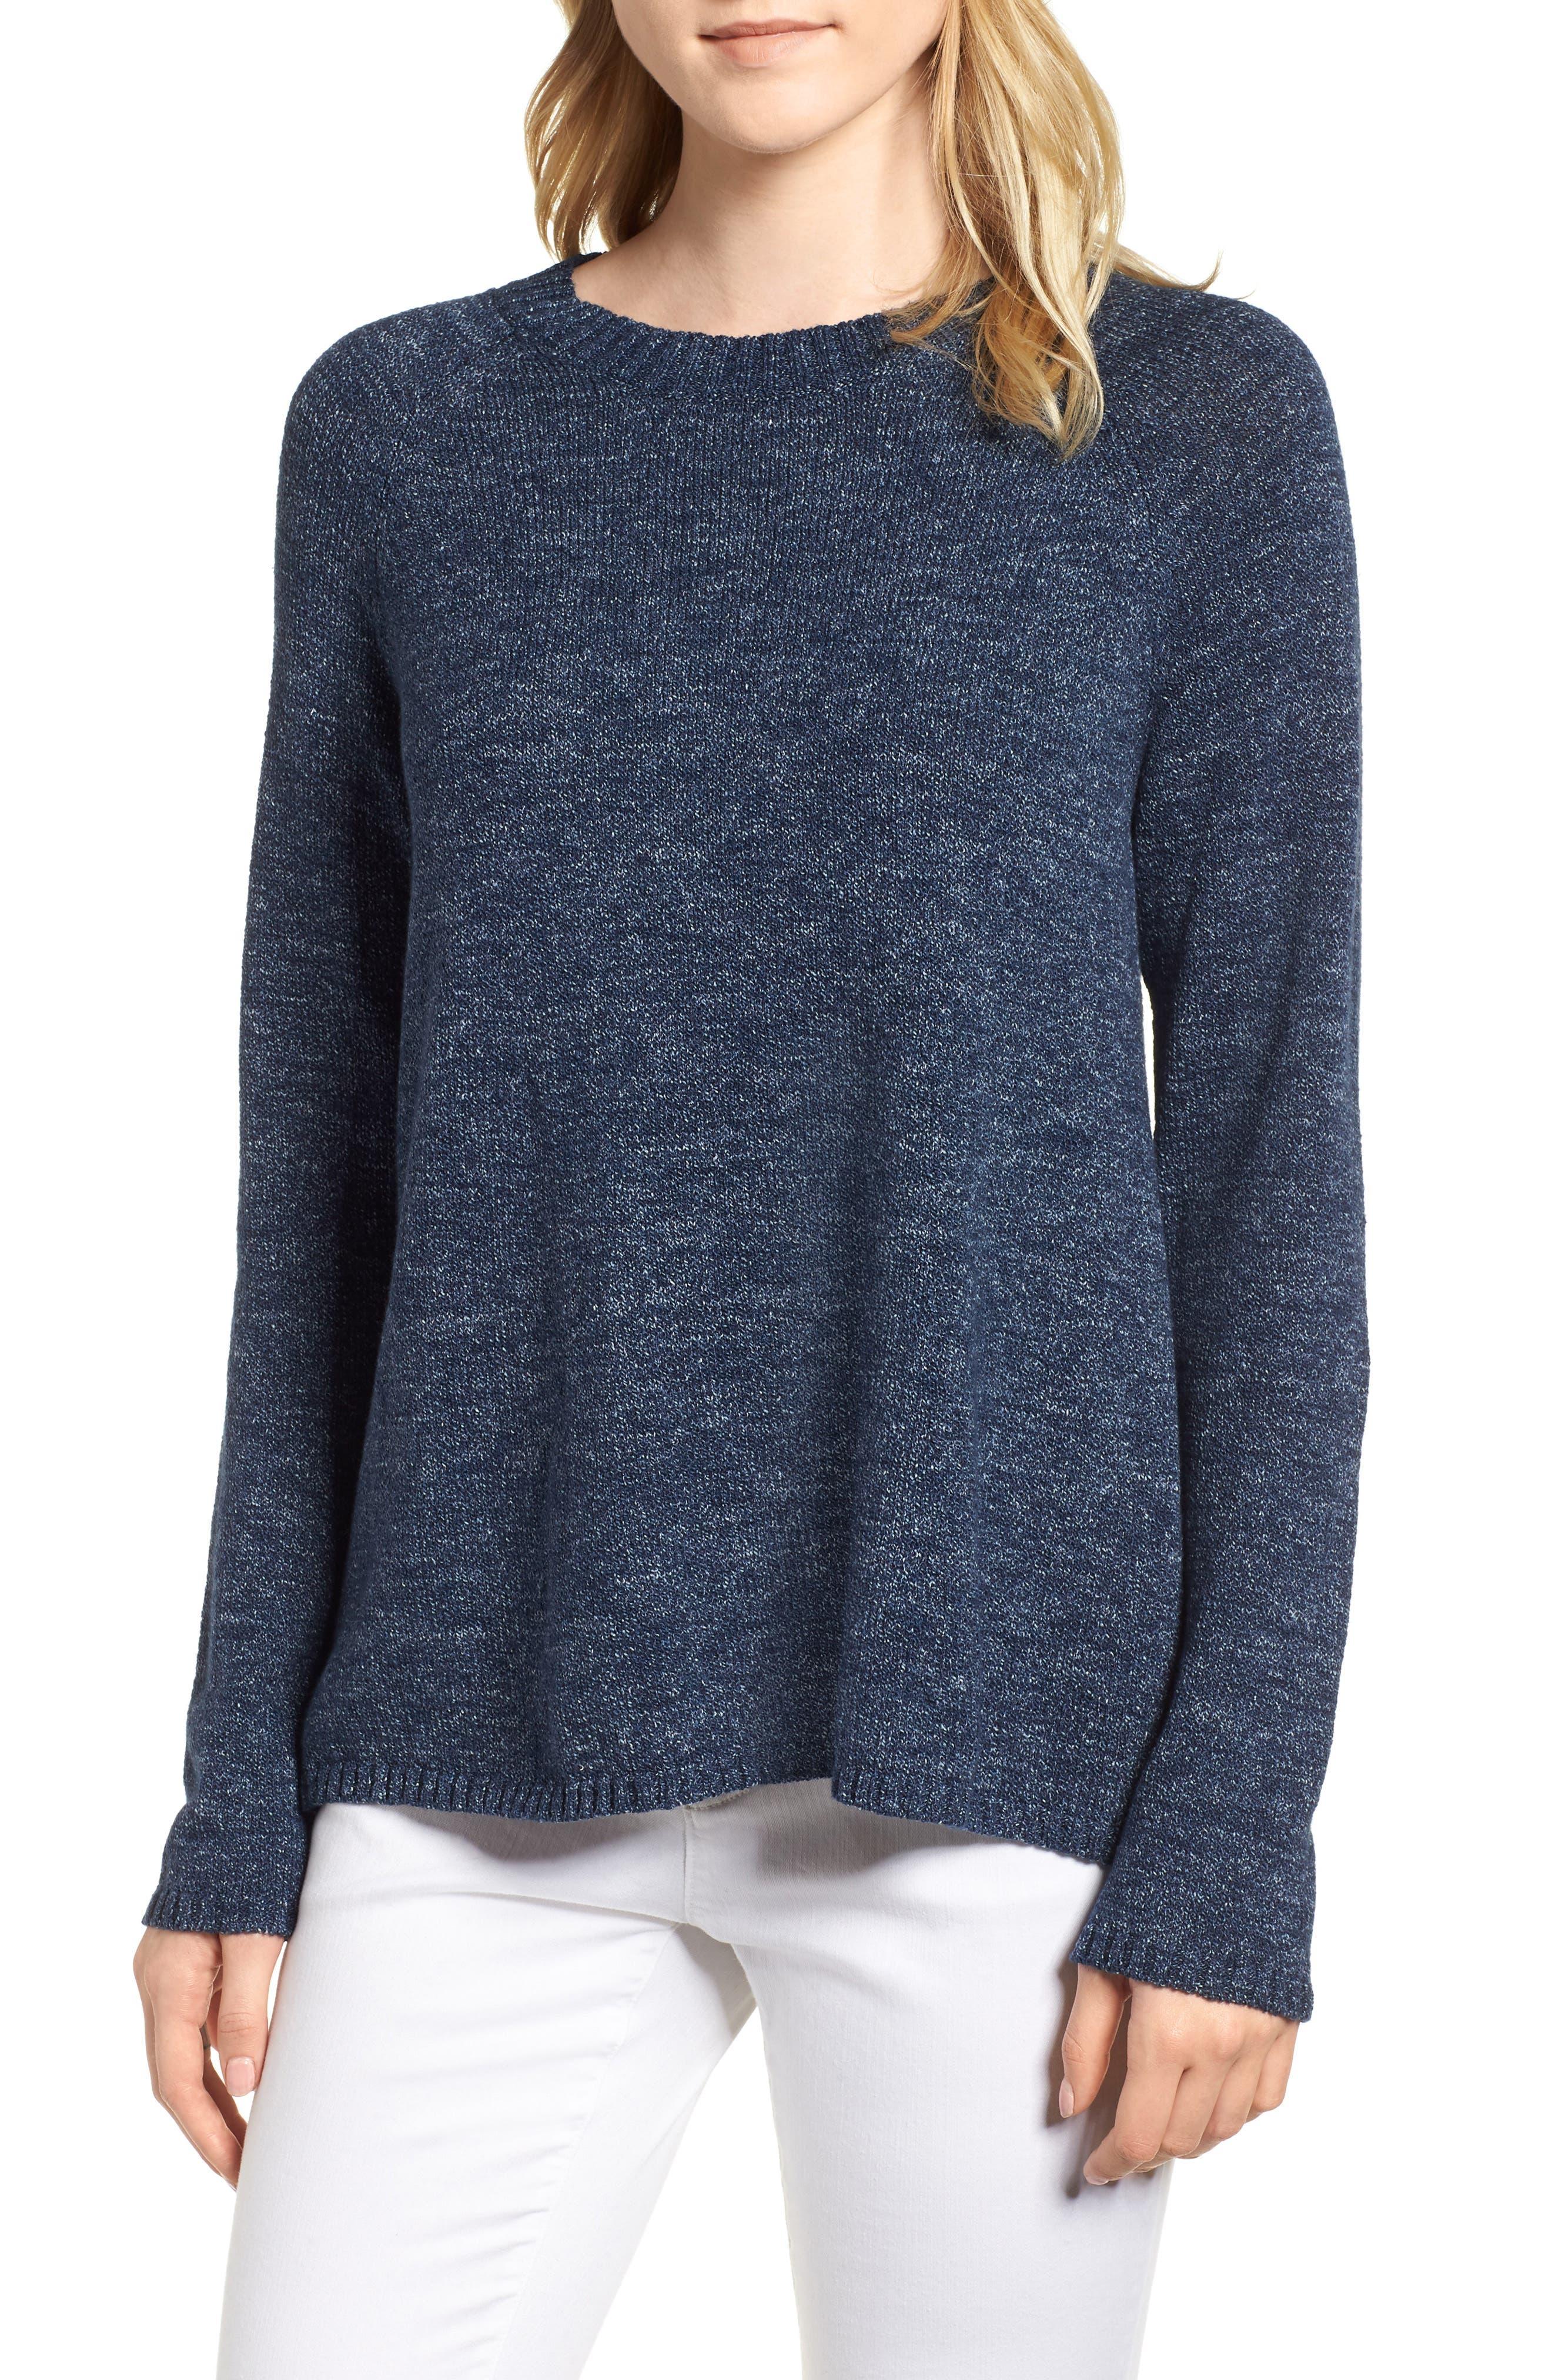 Organic Cotton Sweater,                             Main thumbnail 1, color,                             480